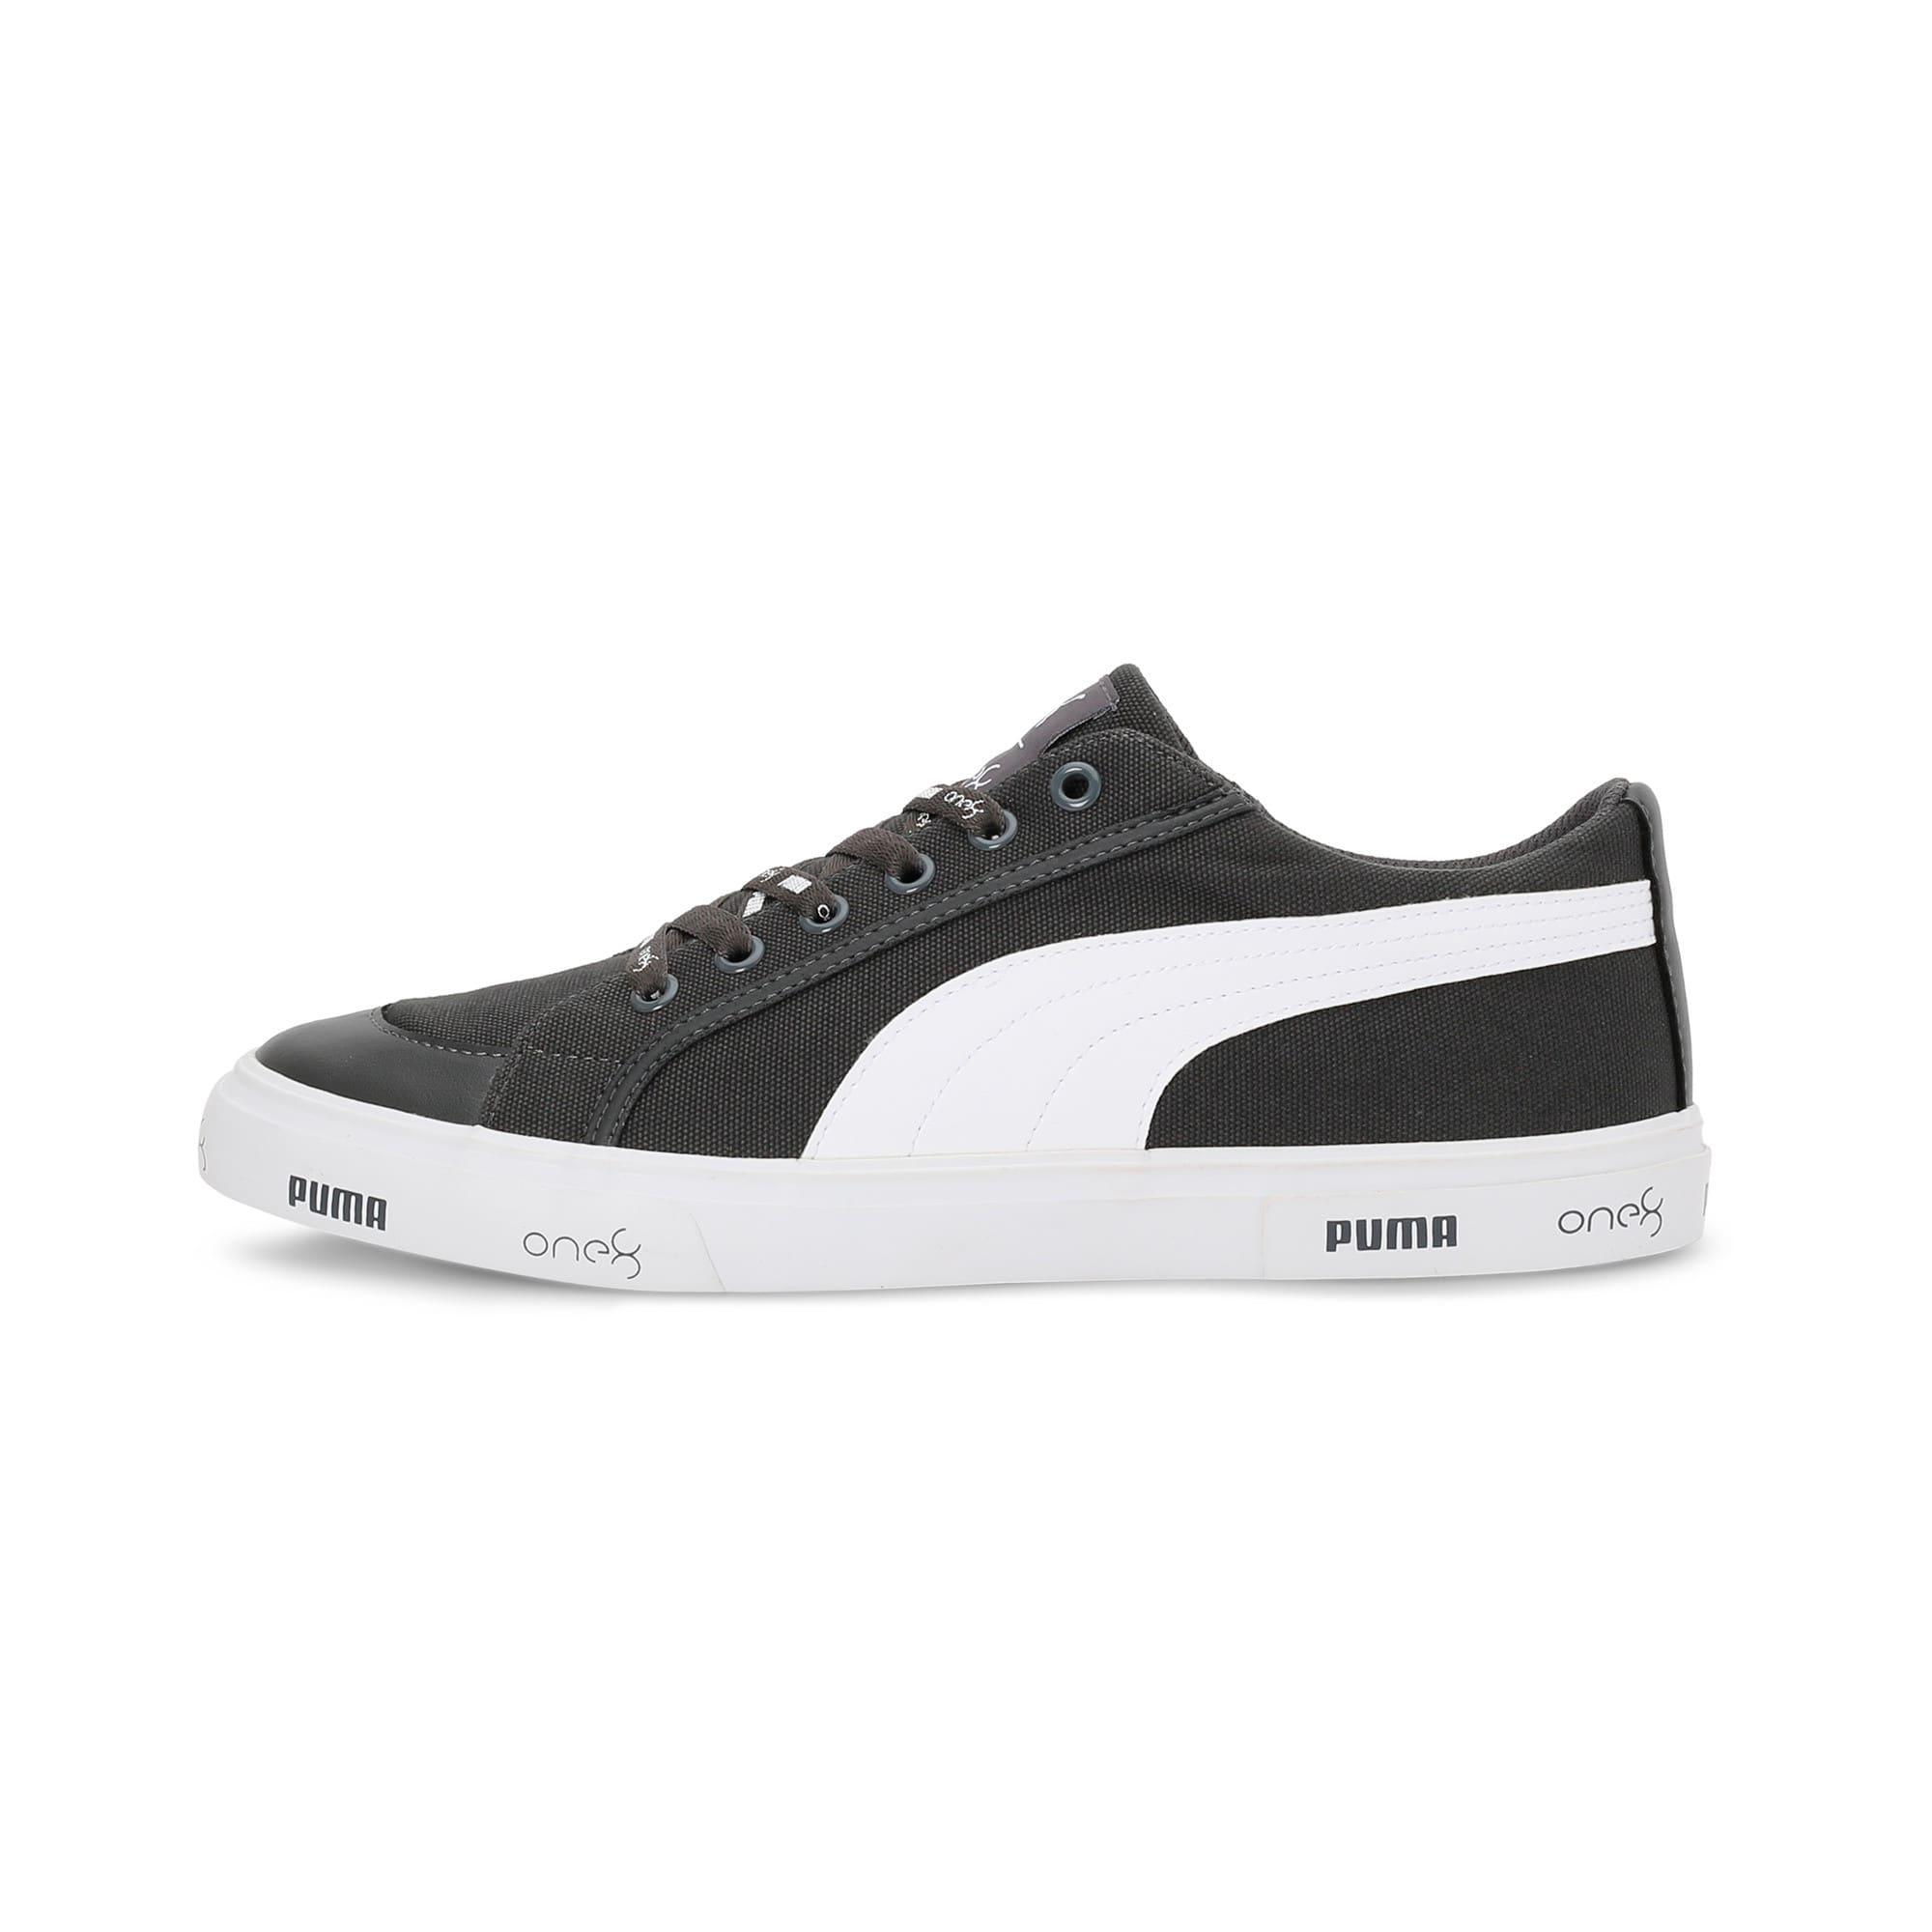 Thumbnail 1 of one8 V2 IDP Men's Sneakers, Iron Gate-Puma White, medium-IND